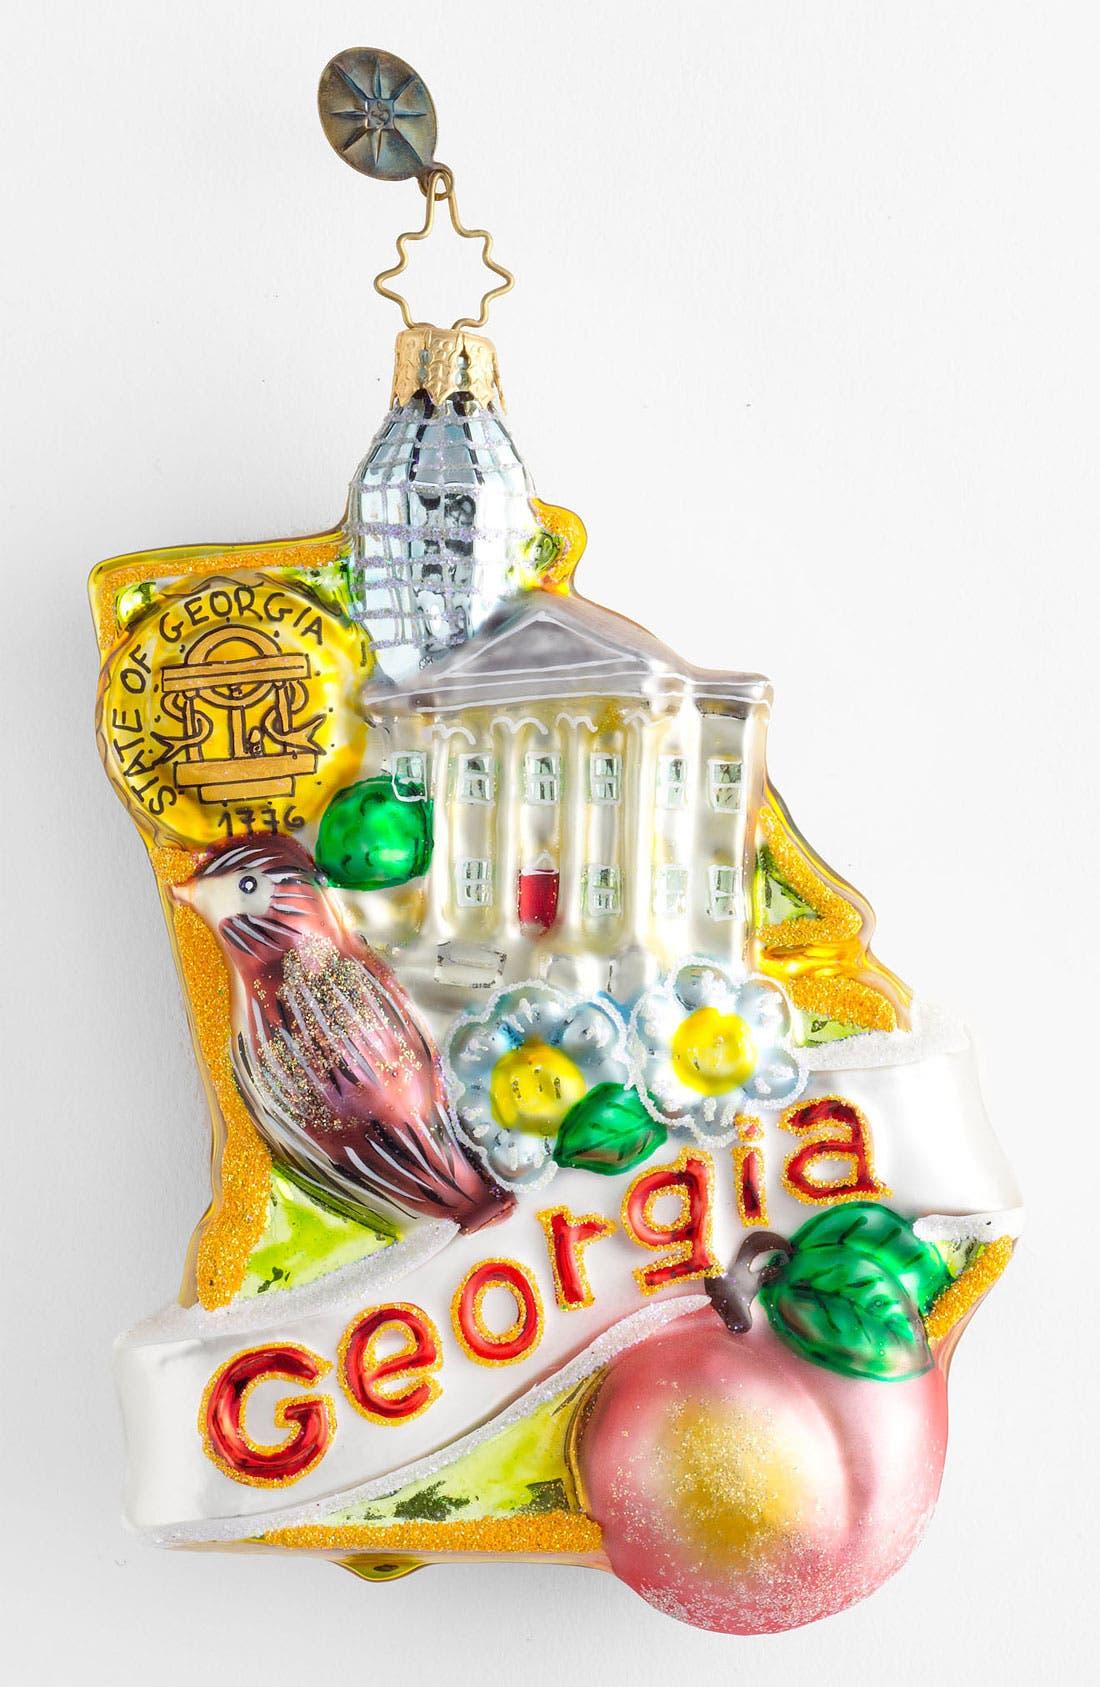 Alternate Image 1 Selected - Christopher Radko 'Georgia on My Mind' Ornament